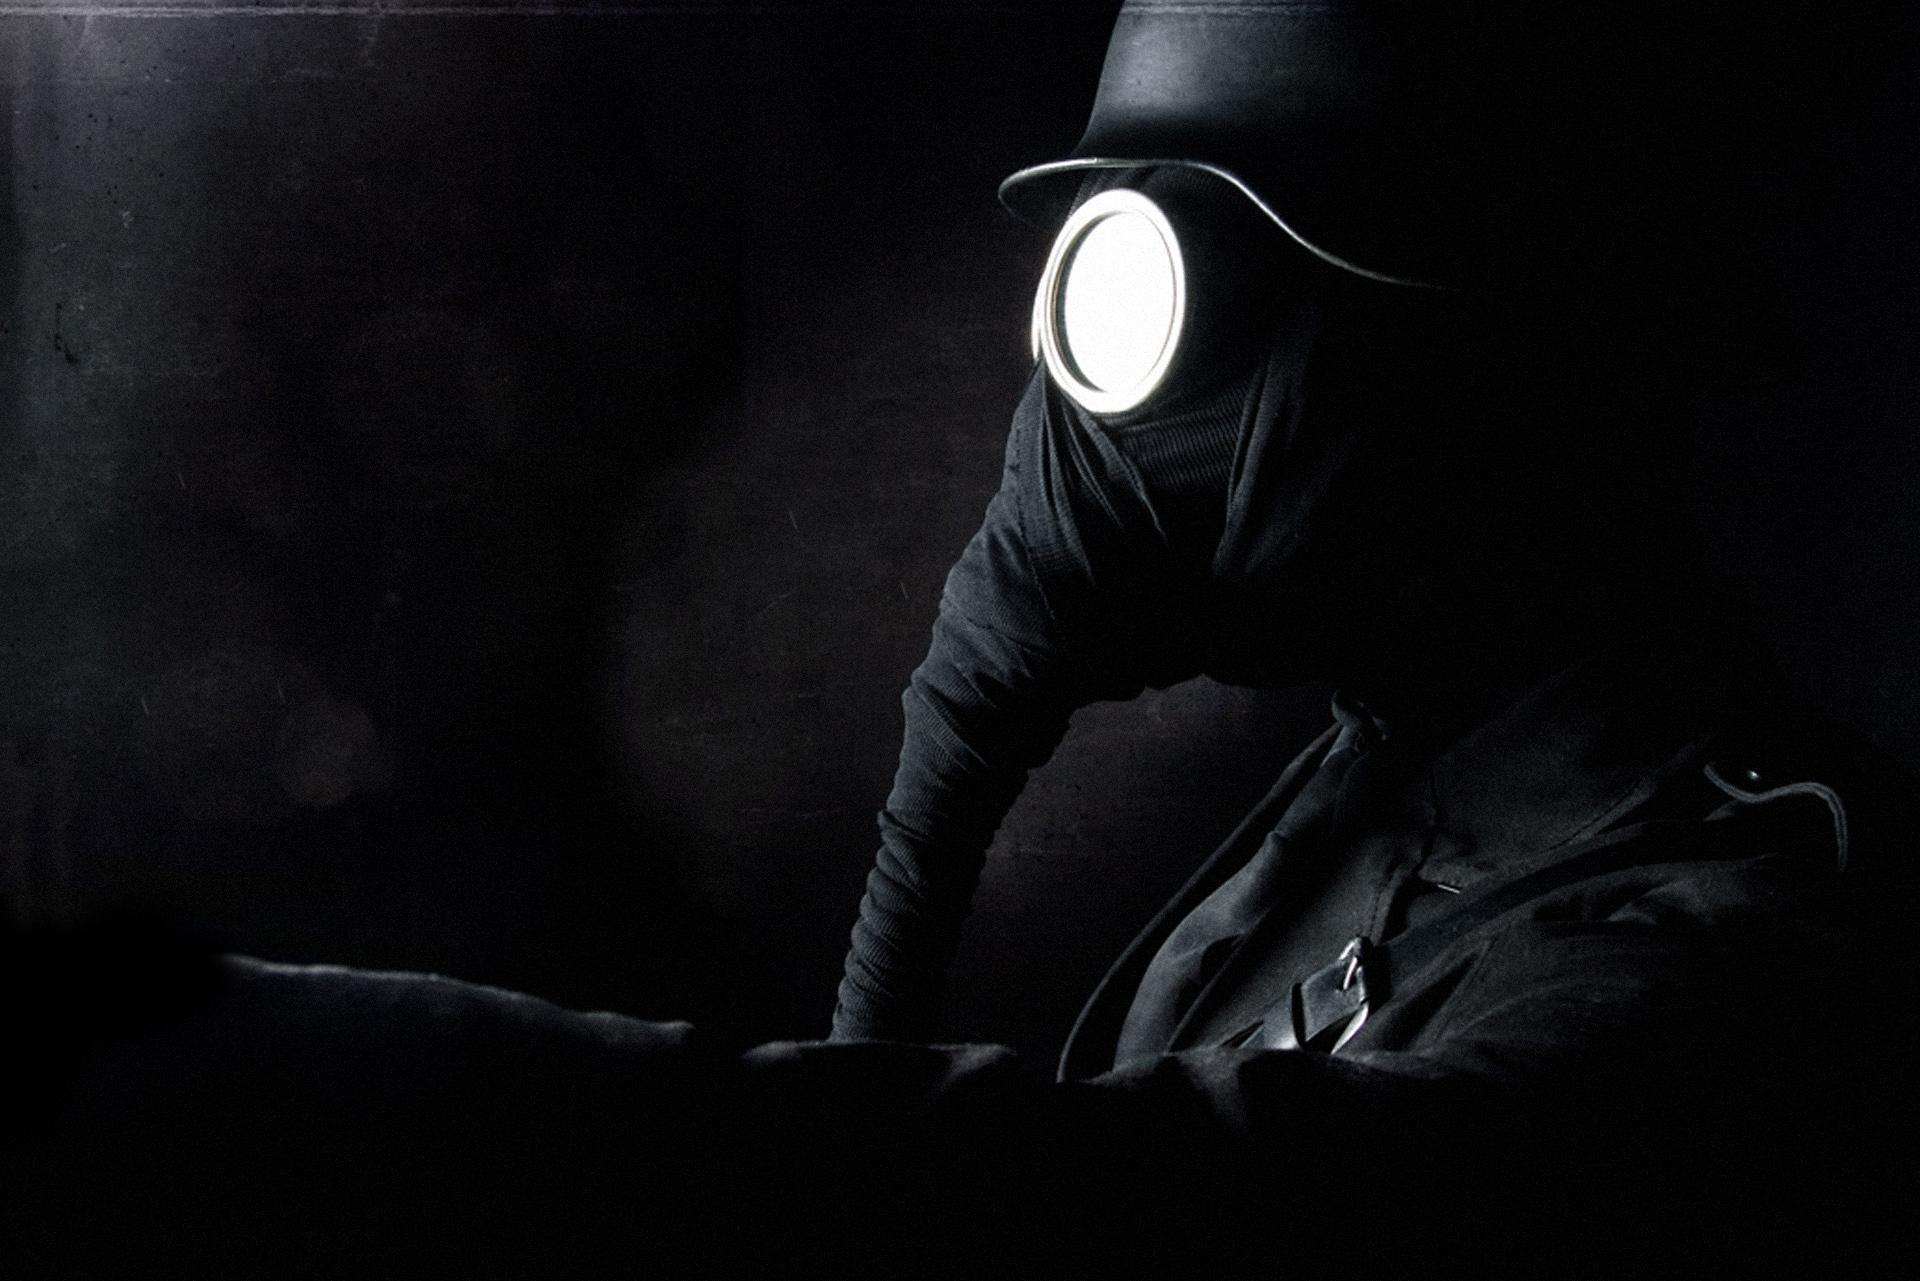 Gas Mask HD Wallpaper | Background Image | 1920x1281 | ID ...